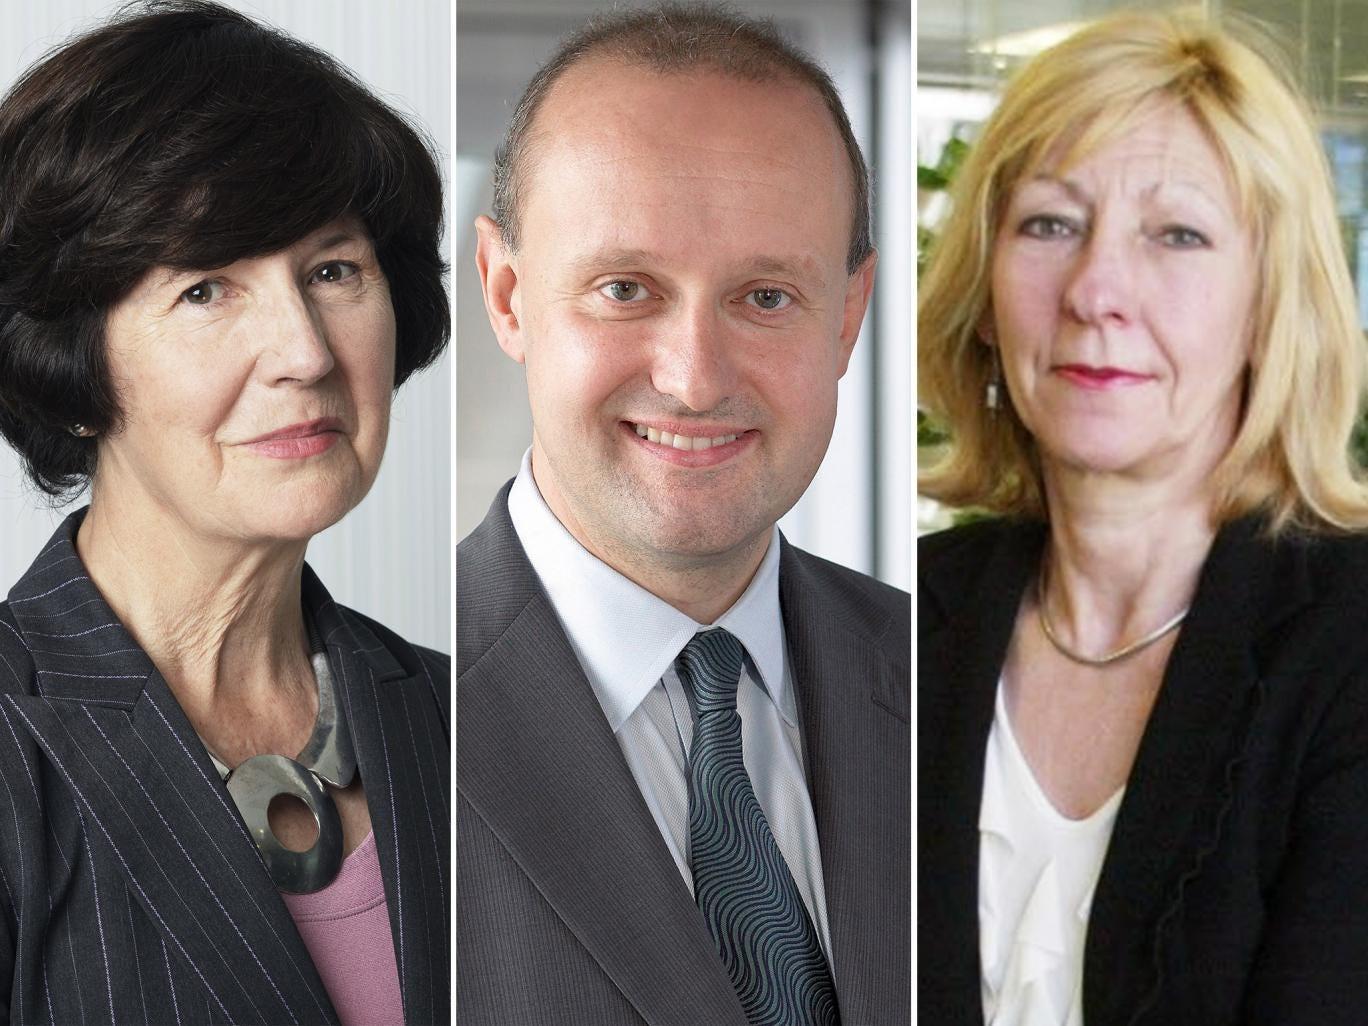 Baroness Sarah Hogg, Nick Prettejohn and Baroness Patience Wheatcroft